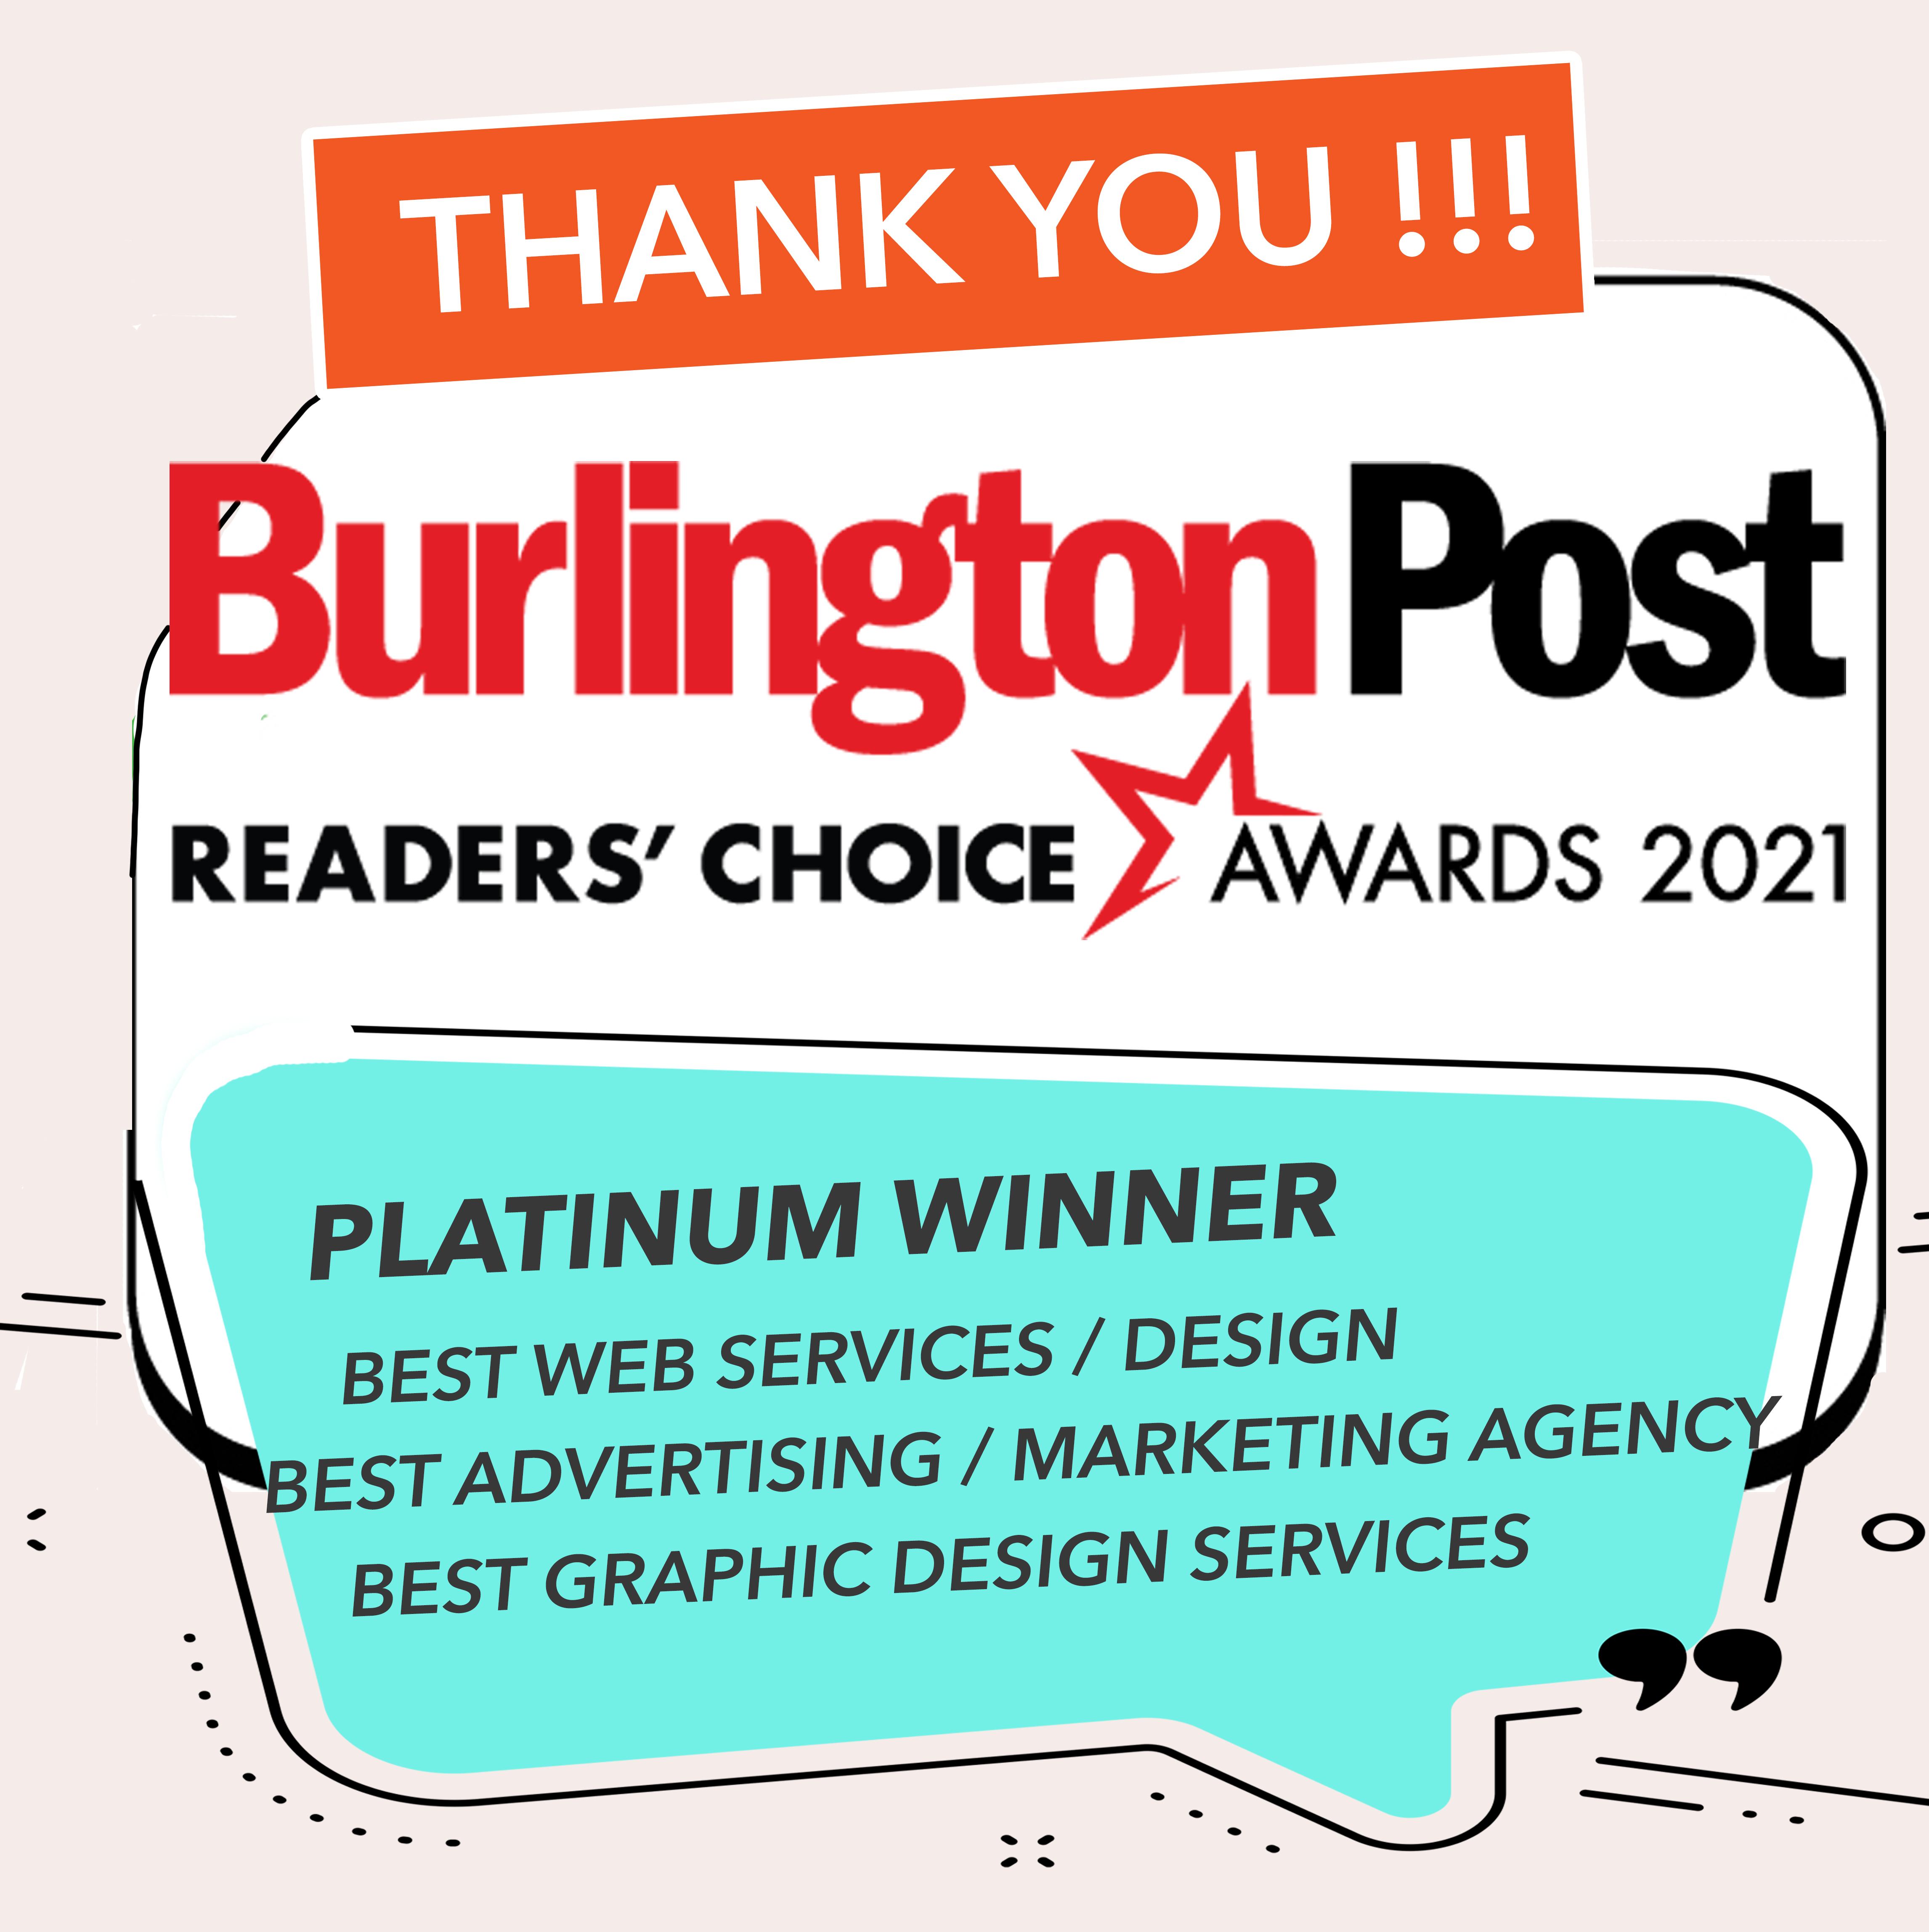 Burlington Post Readers Choice Awards 2021 - Provoke Media & Design - Platinum Winner | Best Web Services/Design | Best Advertising/Marketing Agency | Best Graphic Design Services